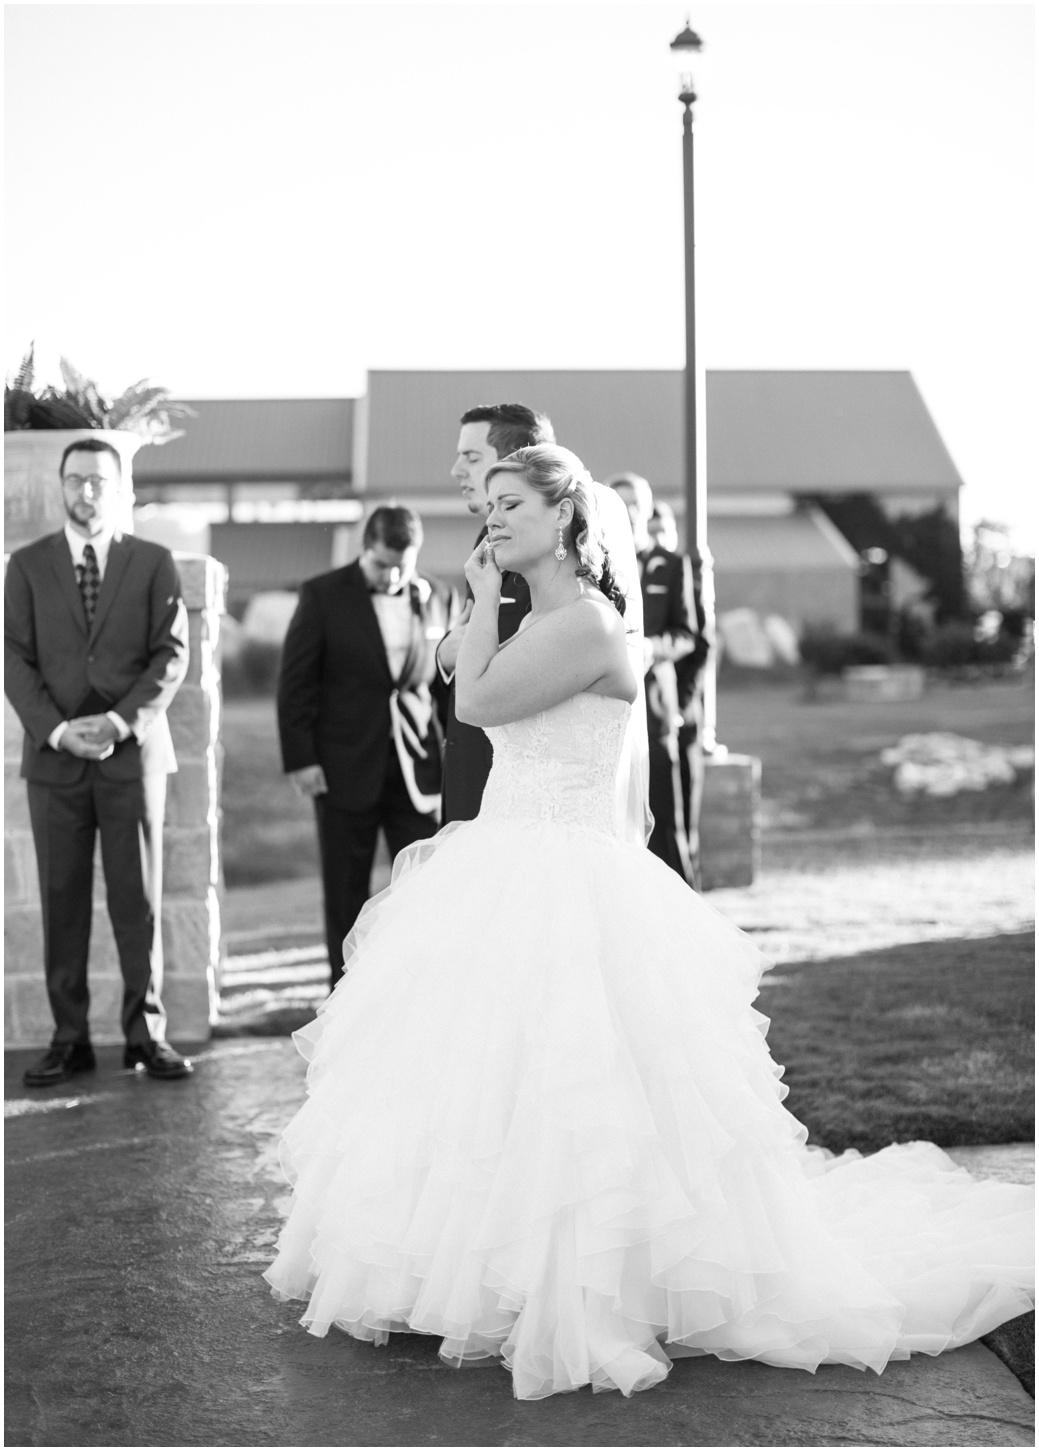 Sarah Best Photography - Jolly Wedding Olde Dobbin Station-262_STP.jpg